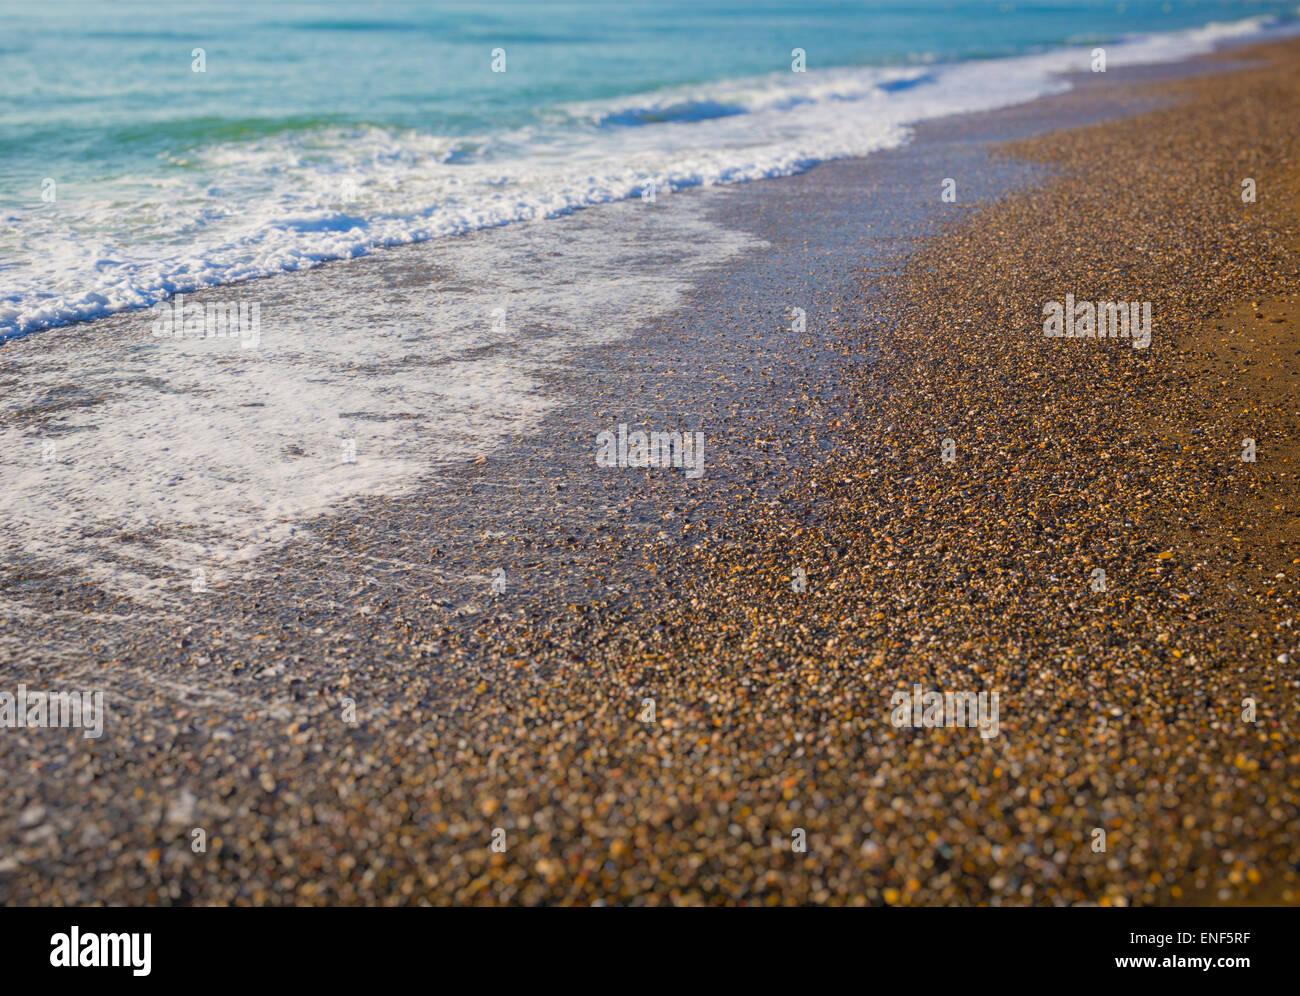 Olas rompiendo en la orilla. Imagen De Stock